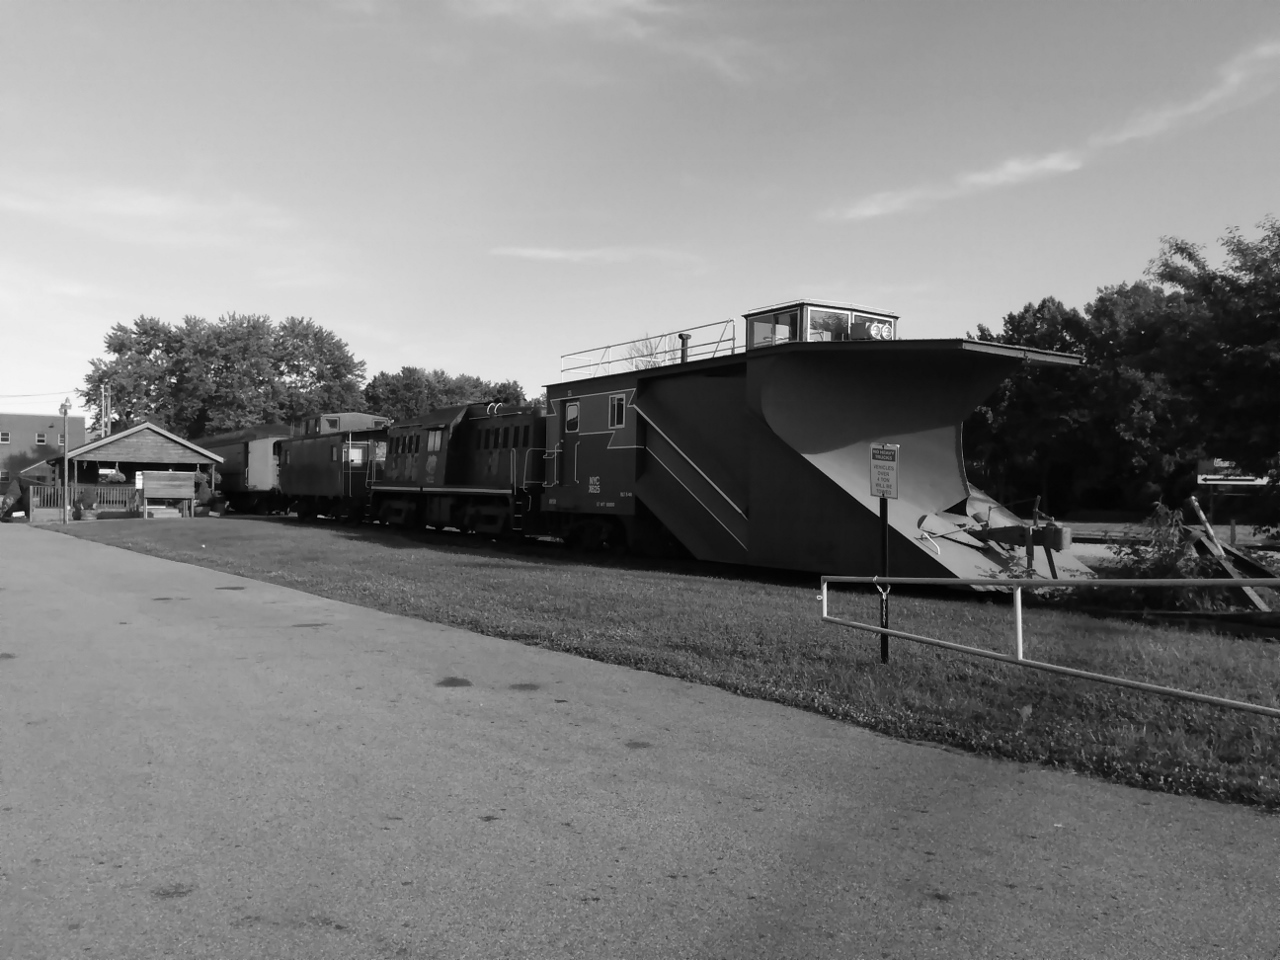 Hocking Valley Scenic Railway - BW 6-14-2018 6-41-46 PM